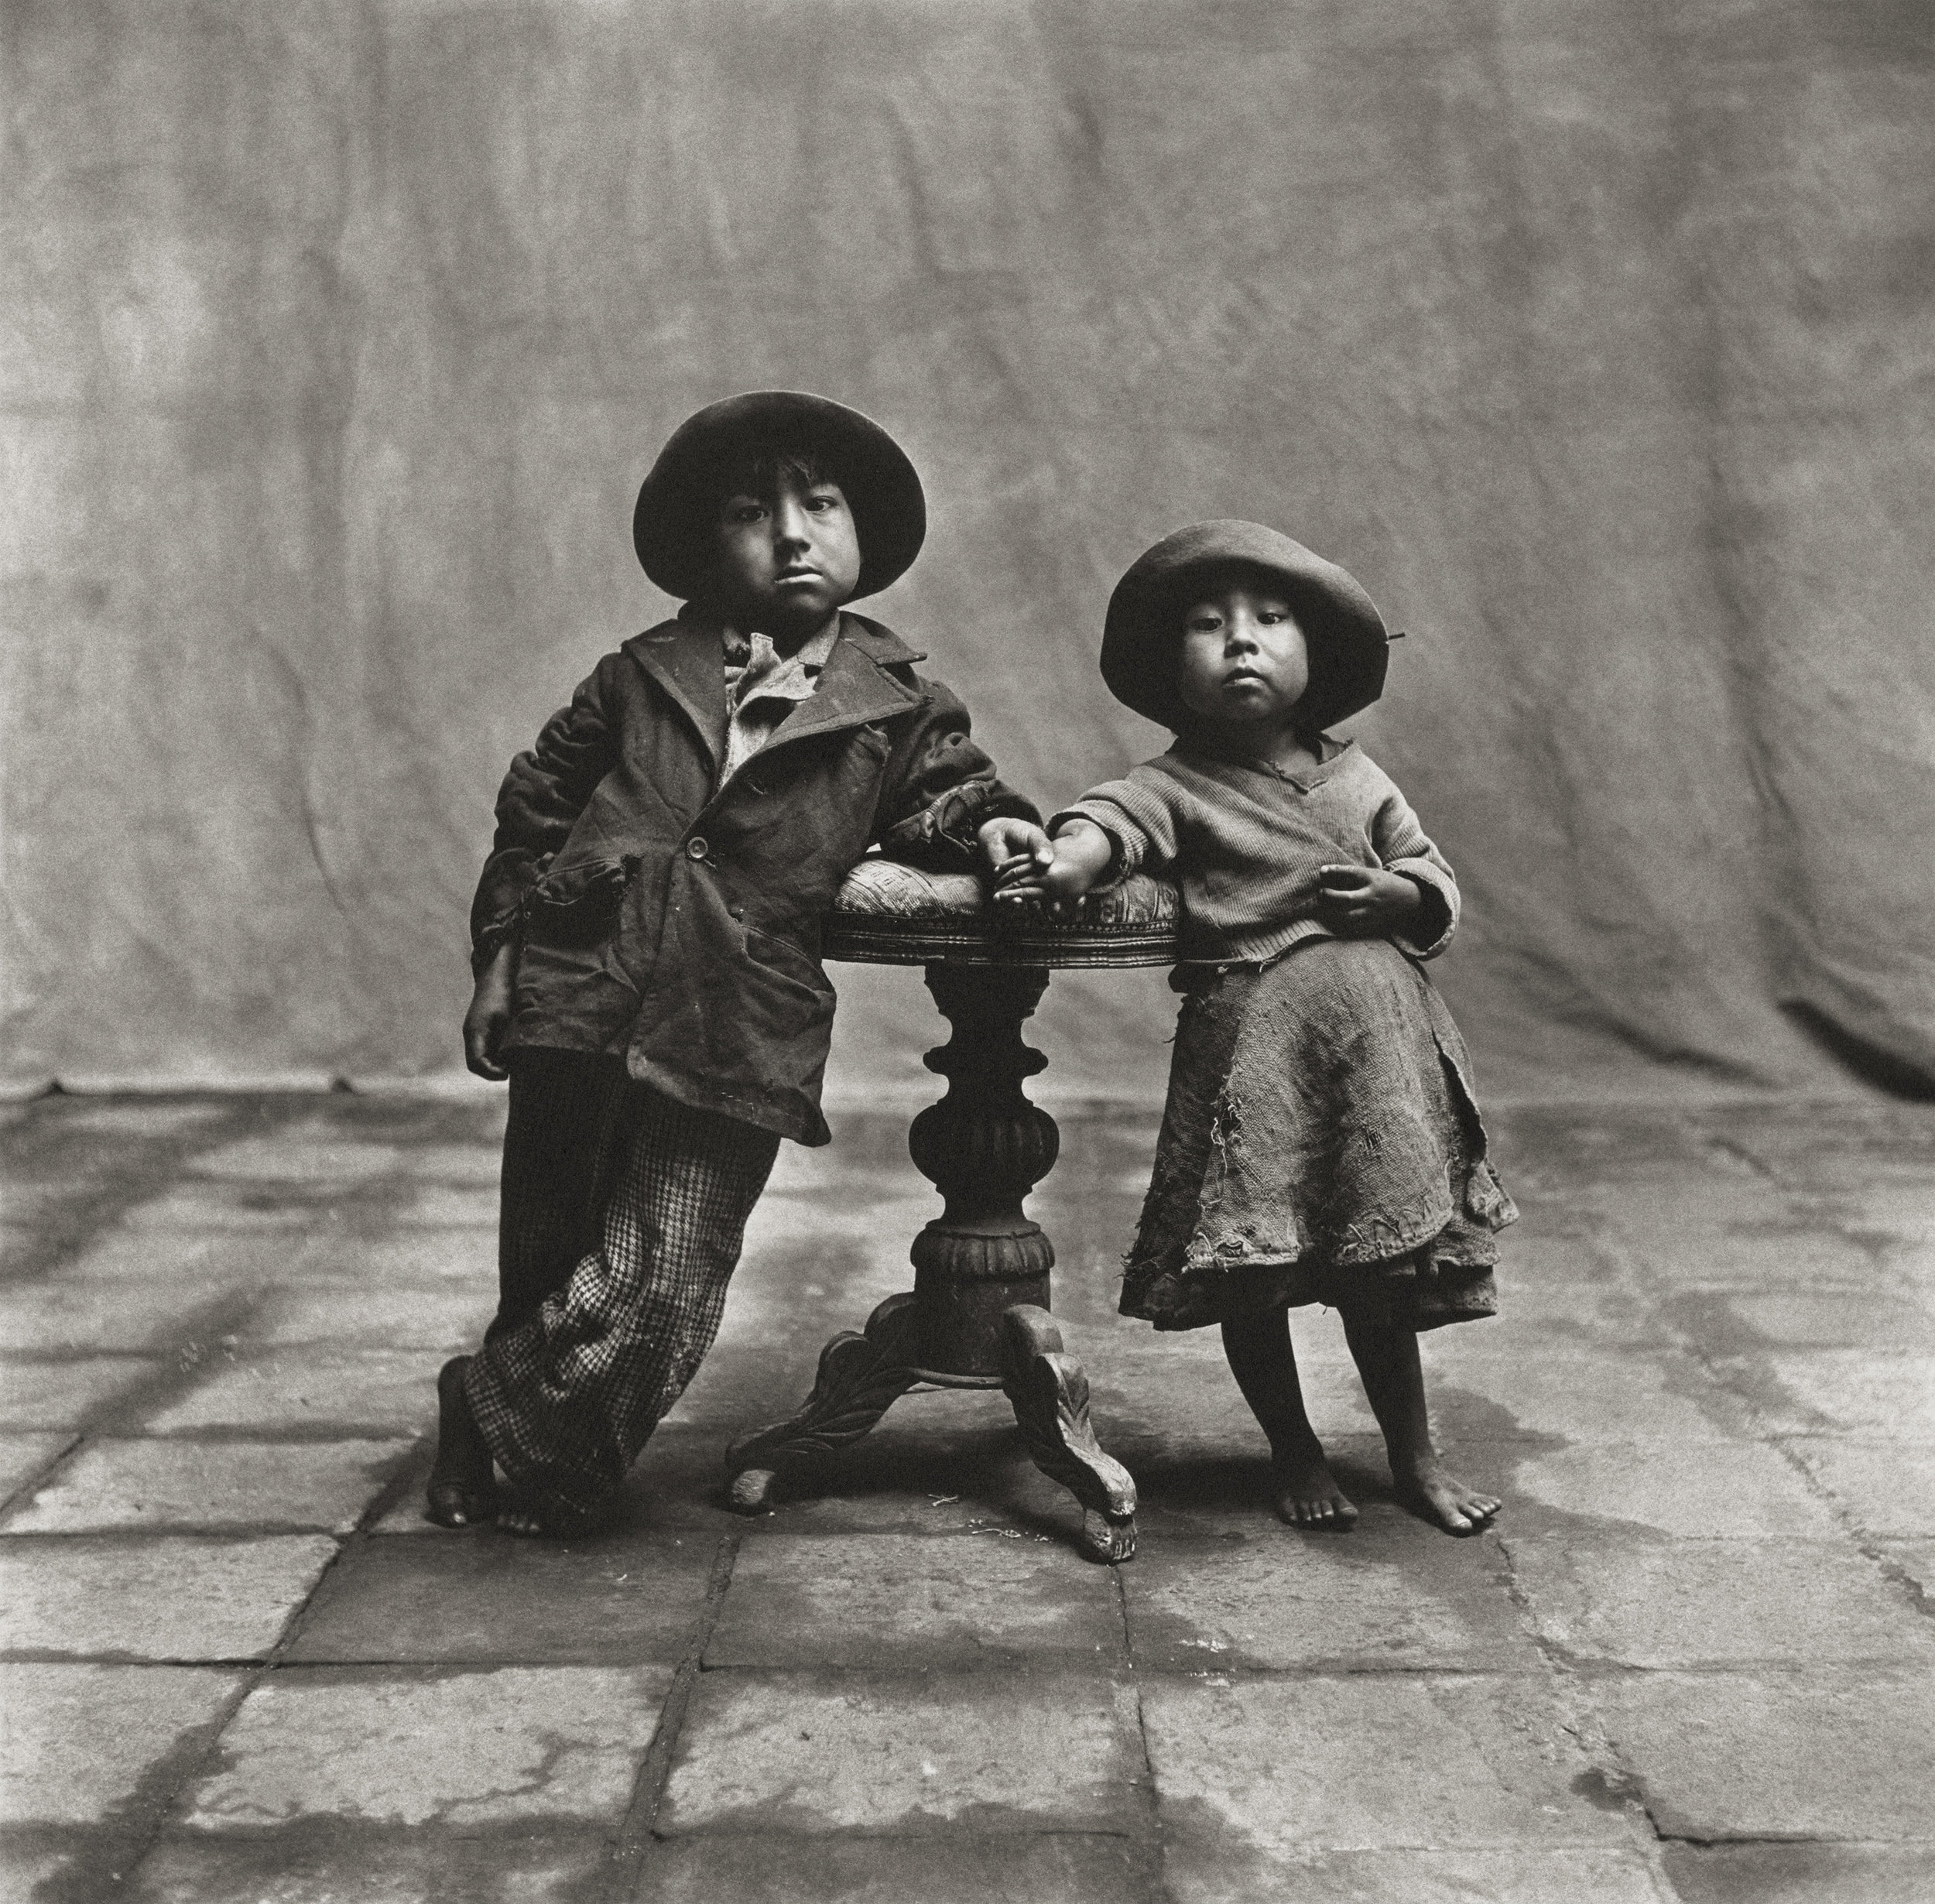 Irving Penn (American, 1917–2009)    Cuzco Children , 1948    Platinum-palladium print, 1968  19 ½ × 19 ⅞ in. (49.5 × 50.5 cm)  The Metropolitan Museum of Art, New York  Promised Gift of The Irving Penn Foundation  © Condé Nast